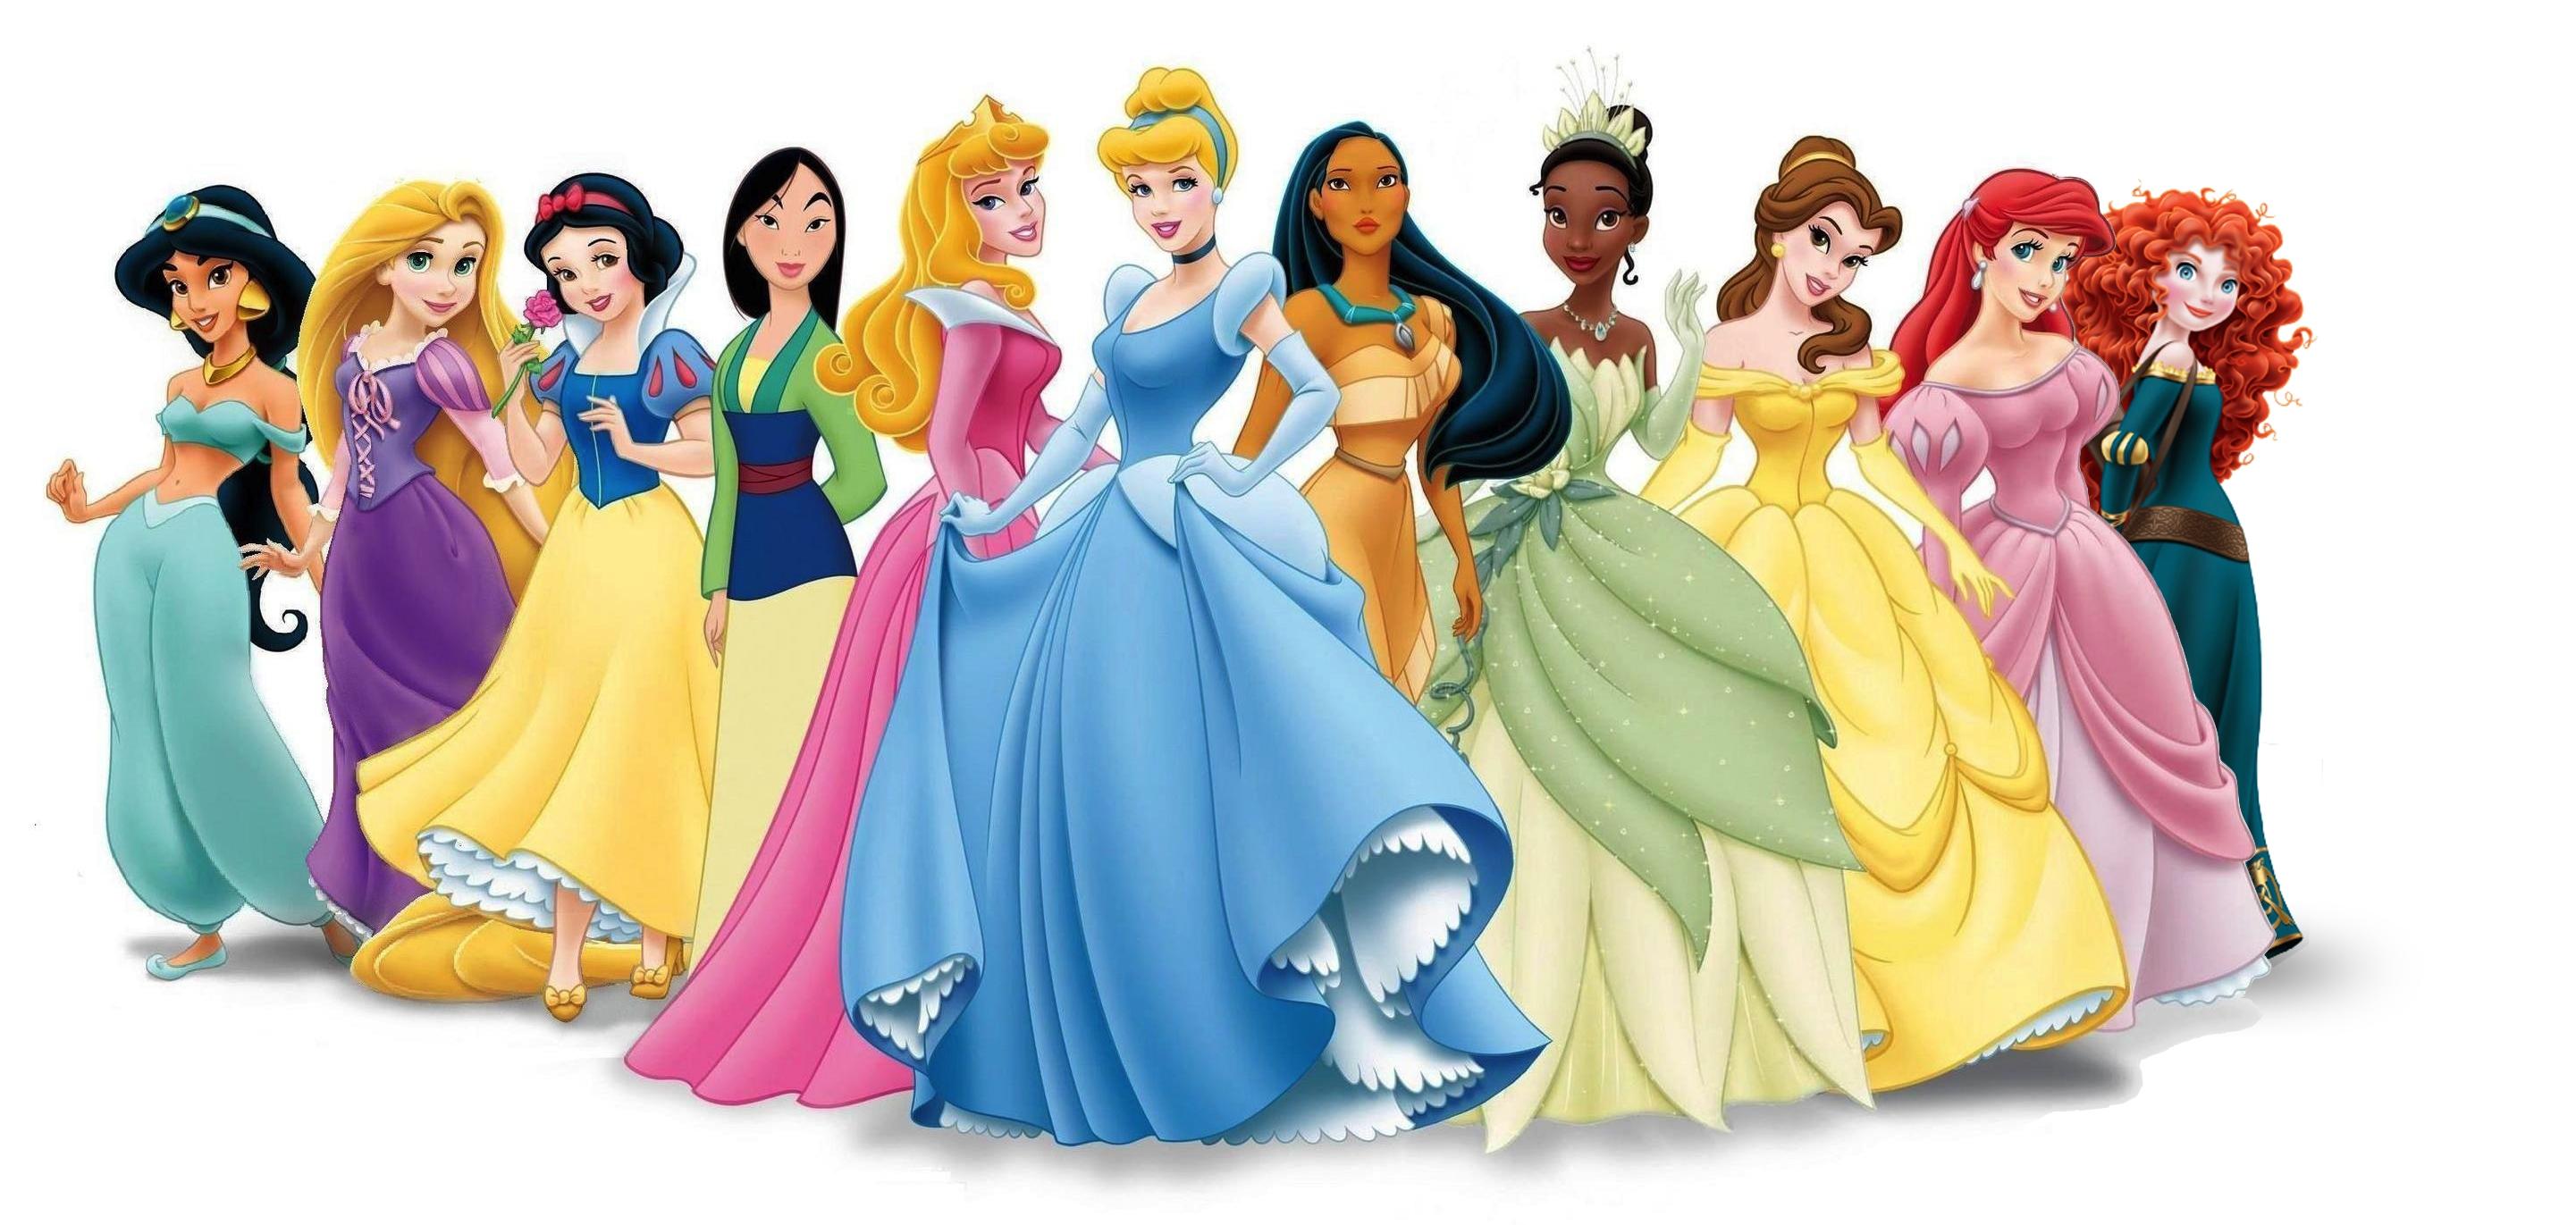 MacytheStrange's Best Disney Princess Body List - Disney Princess - Fanpop